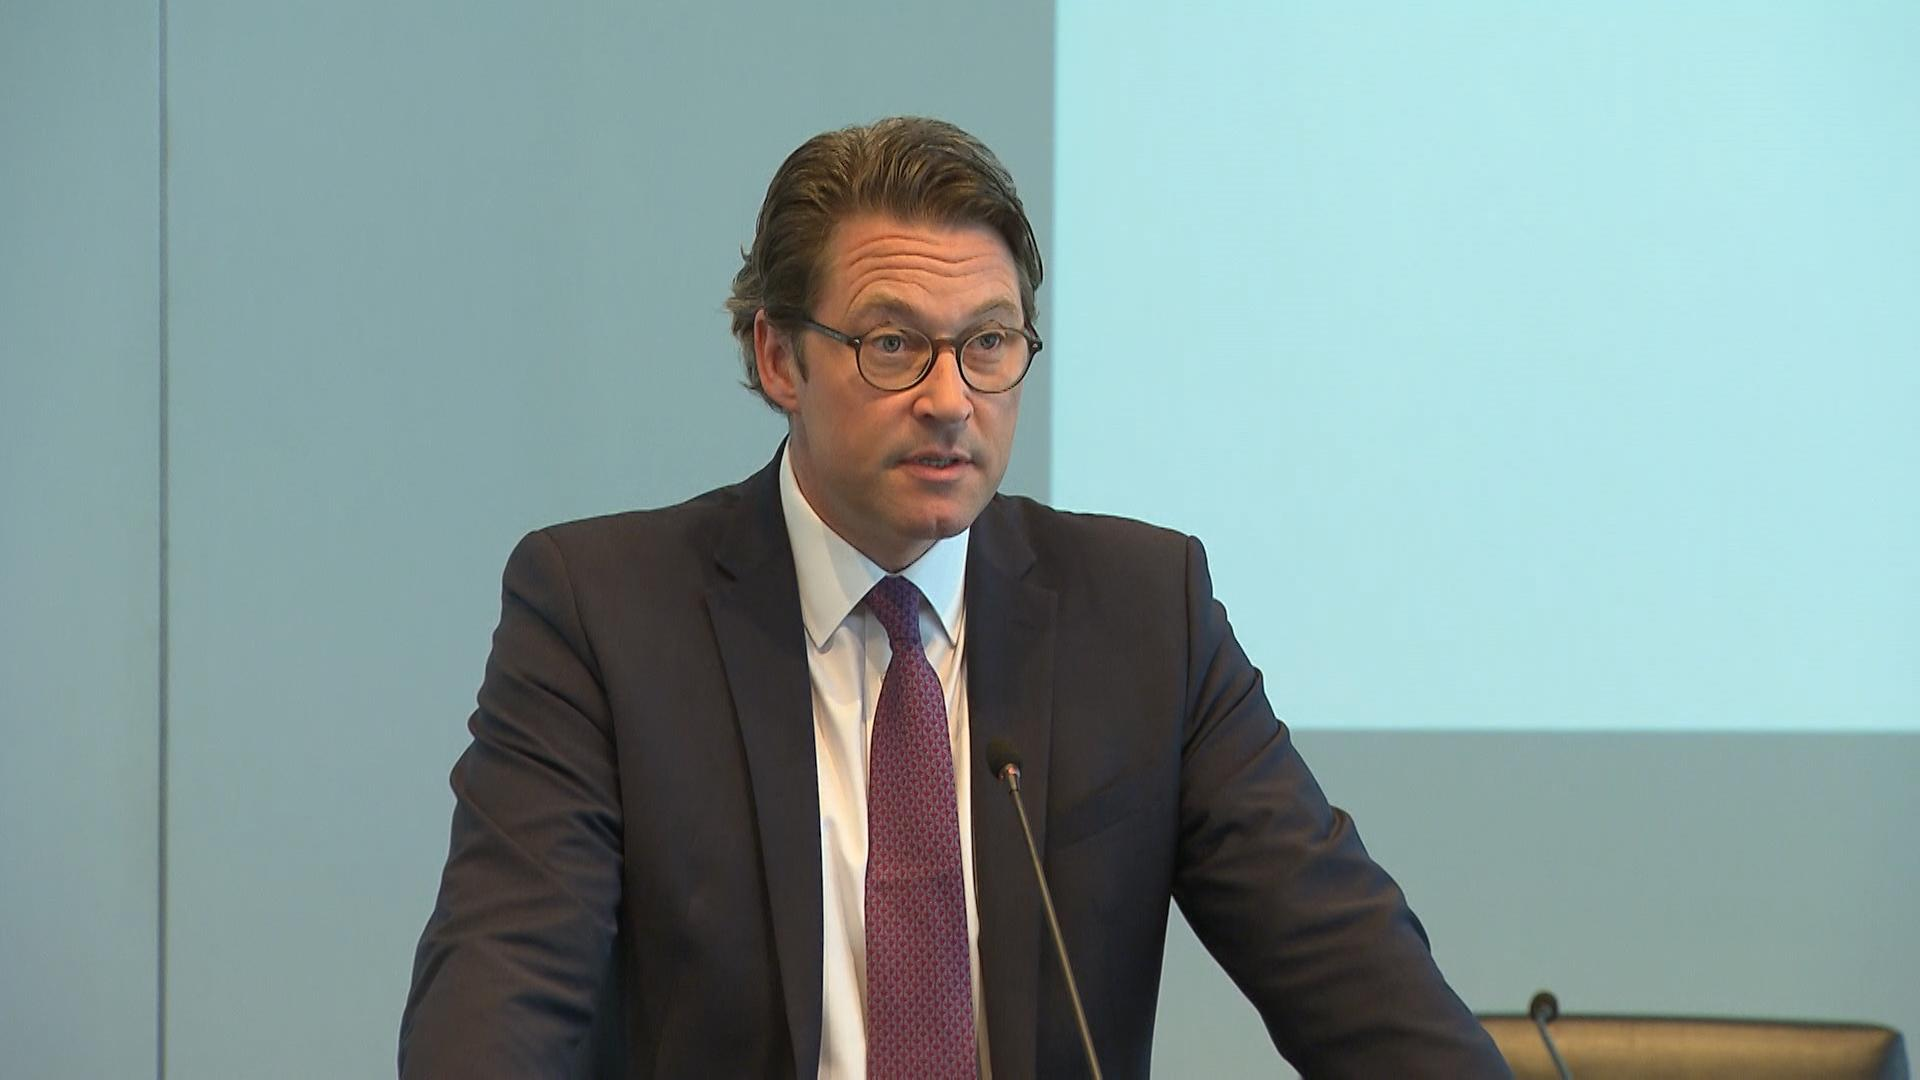 Urteil des EuGH: Deutsche Pkw-Maut verstößt gegen EU-Recht